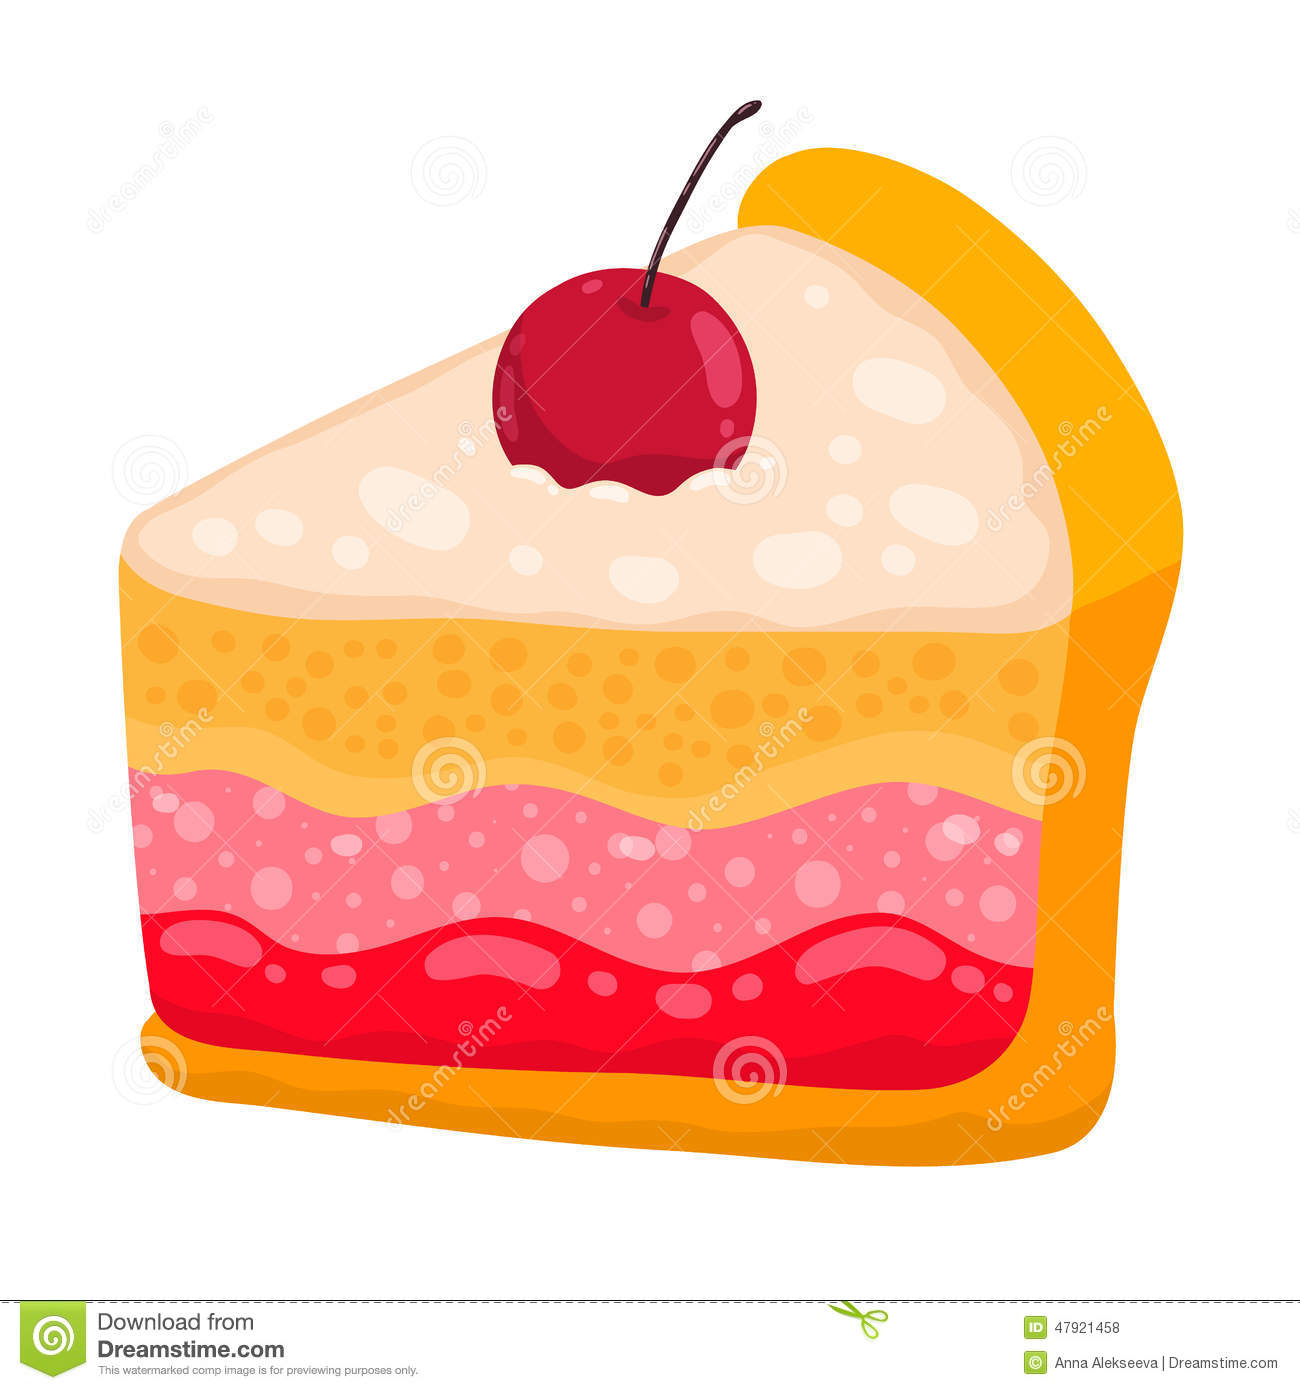 Cute slice of cake clipart clip art library library Cute Cartoon Vector Cake Piece Stock Vector - Image: 47921596 clip art library library